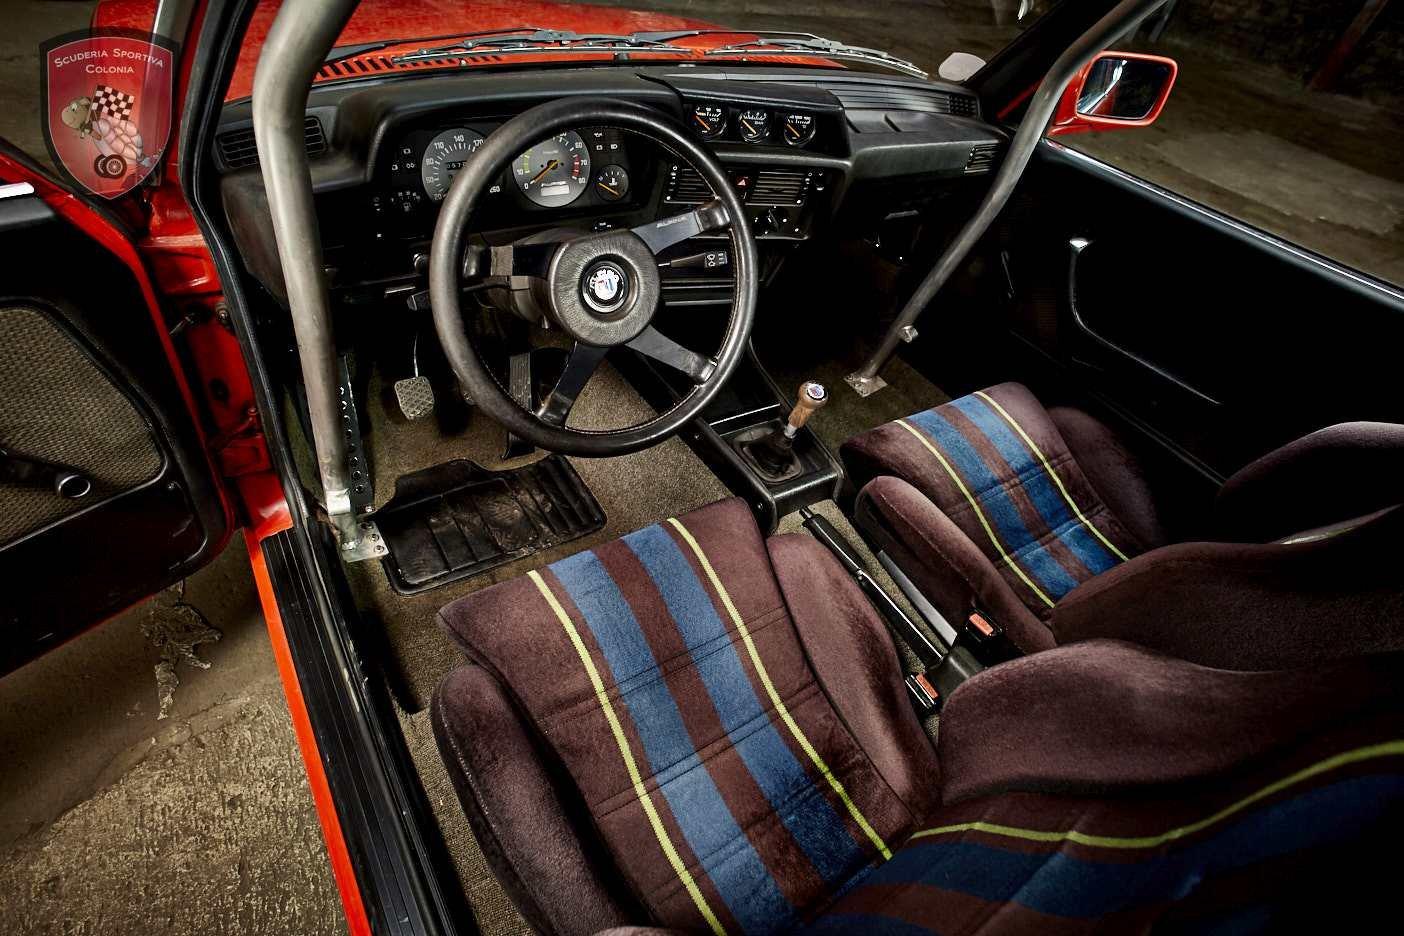 1982 BMW 323 Alpina C1 (E21) For Sale (picture 4 of 6)